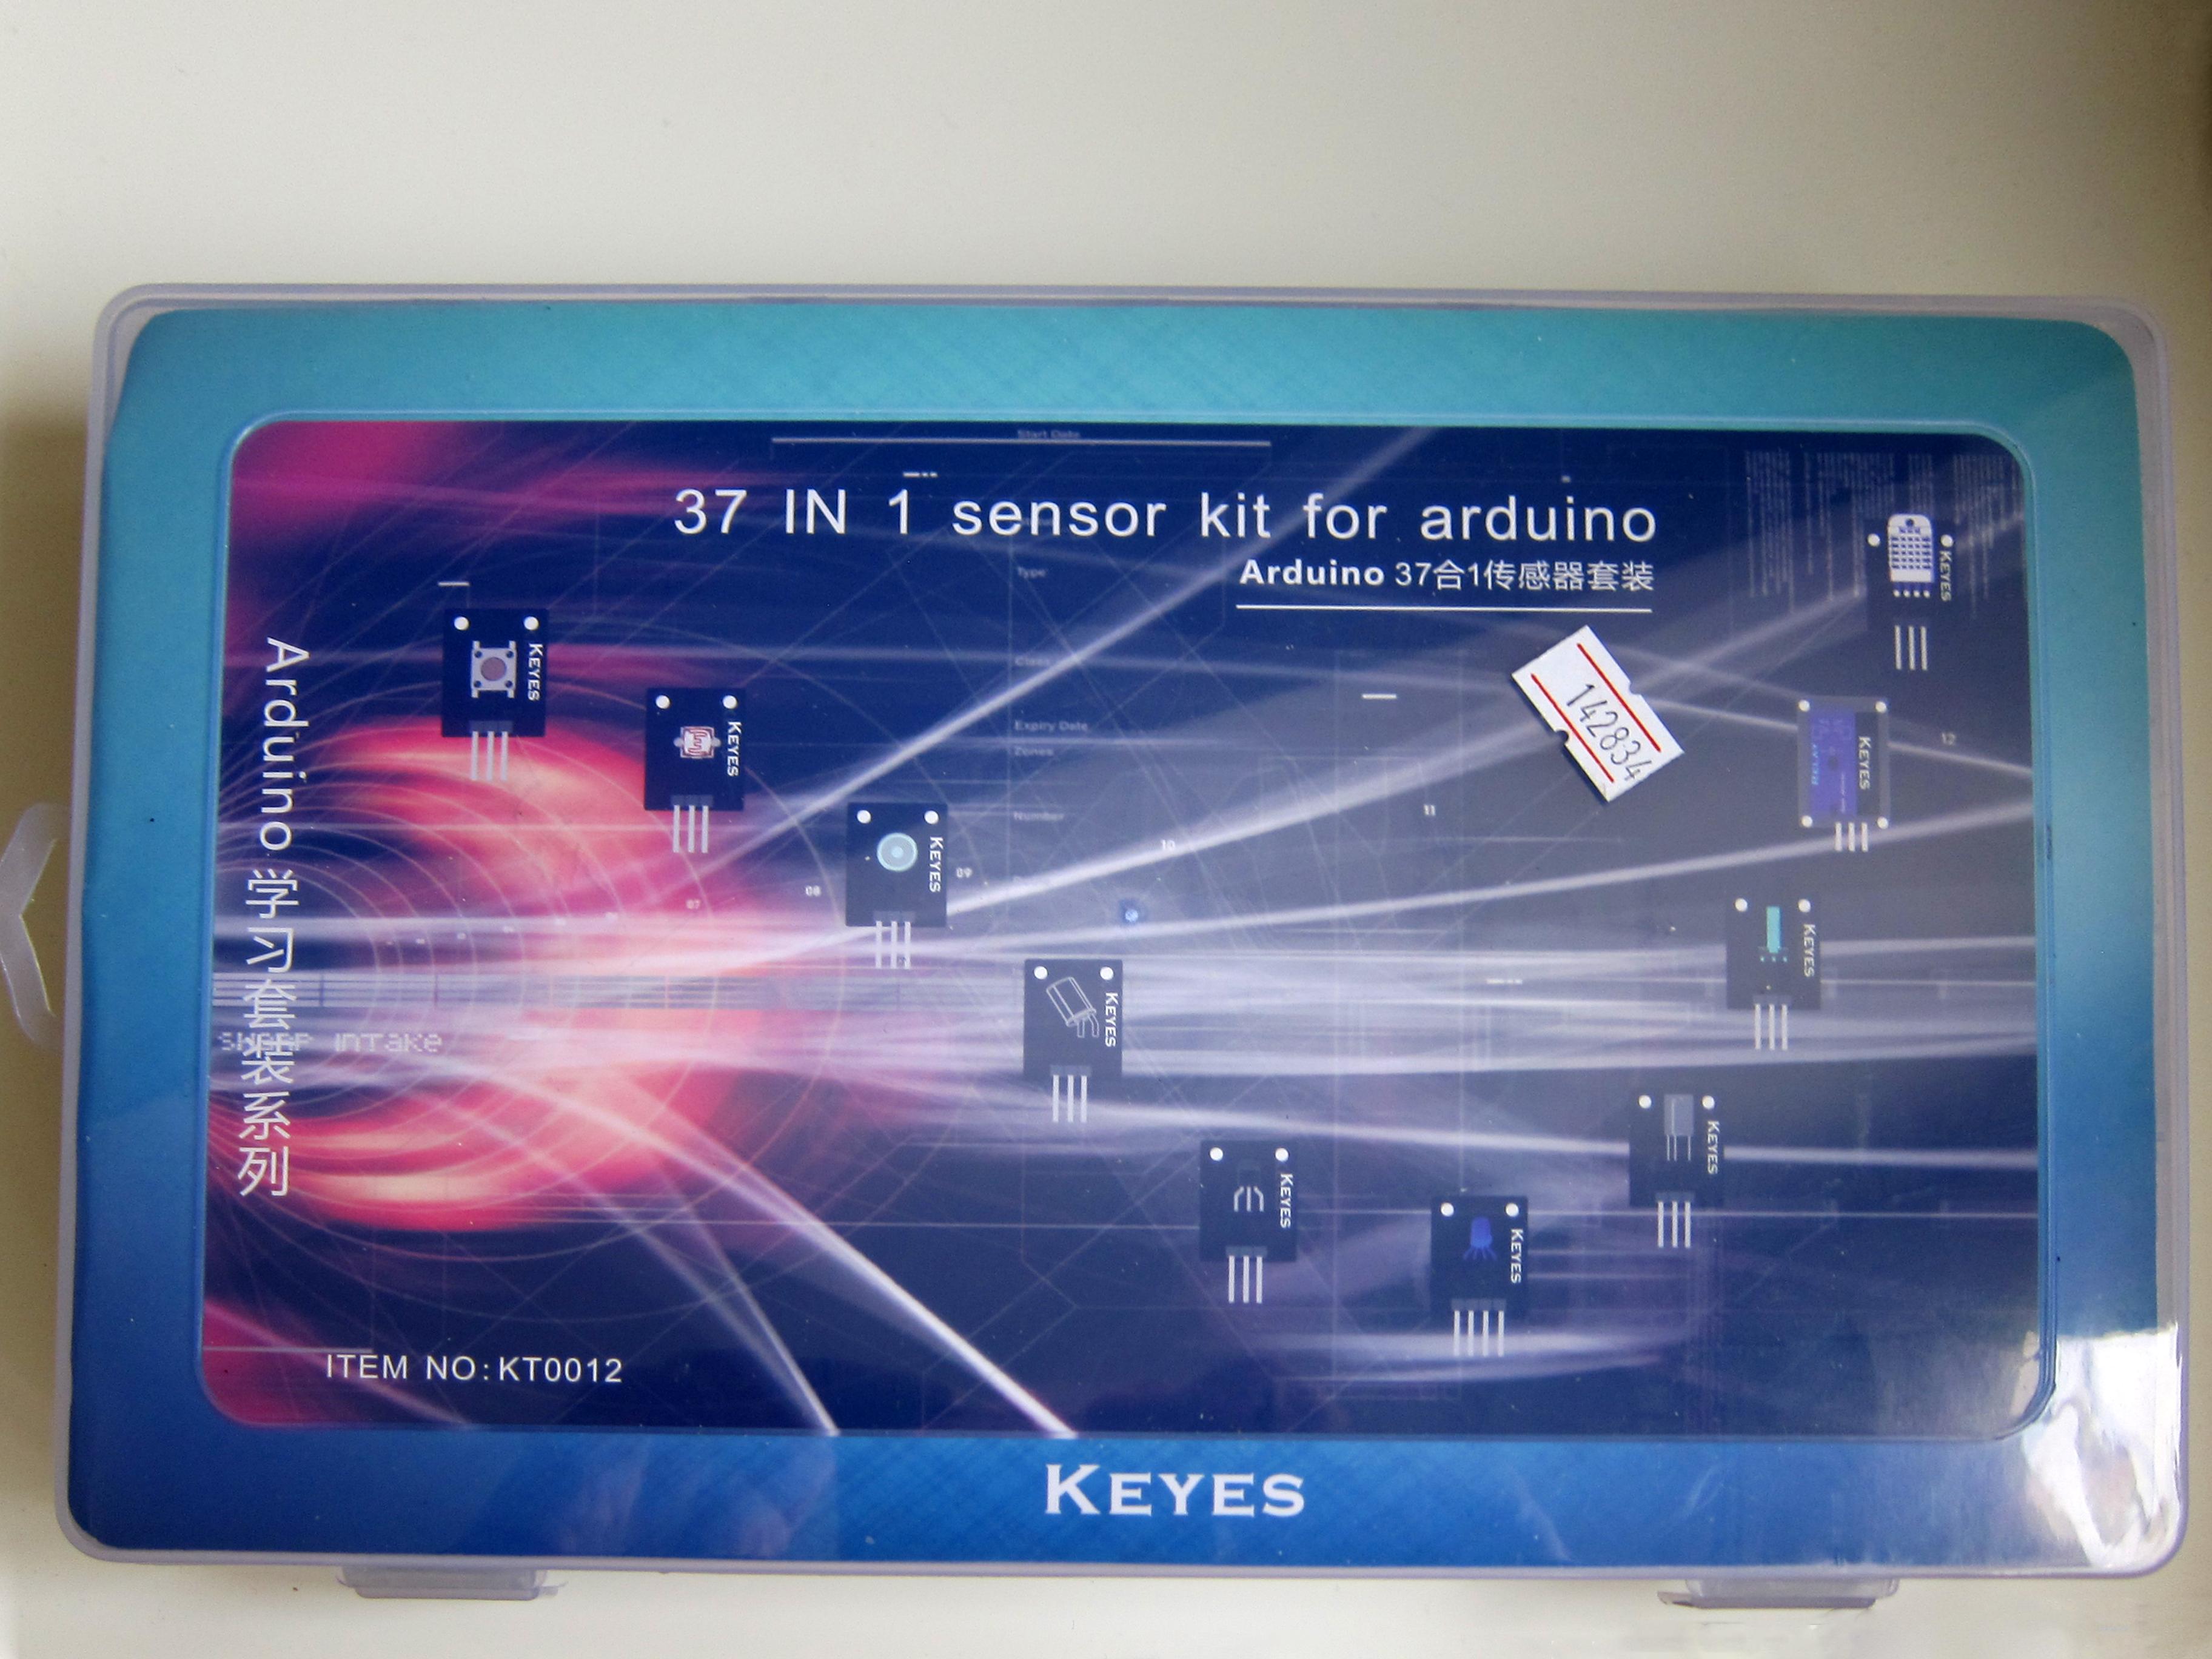 Arduino kits, components, I/O components, sensors